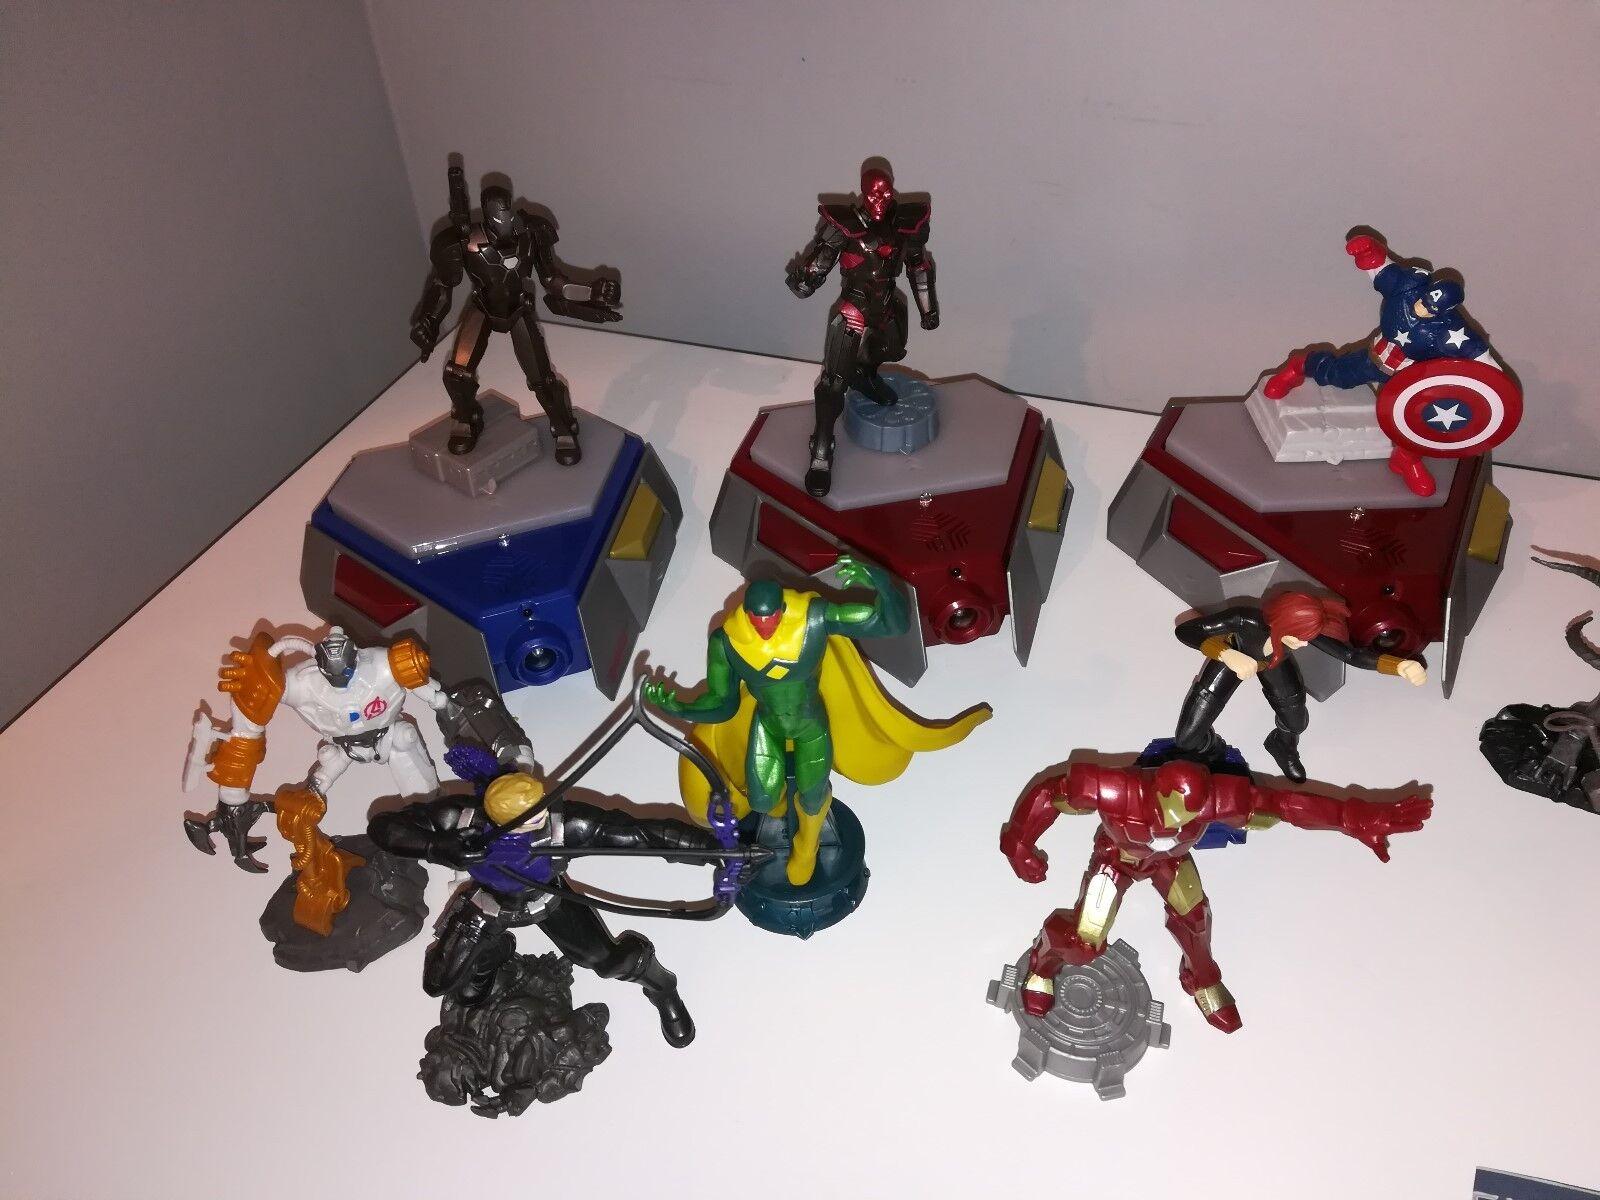 Hasbro Playmation Marvel lot - Hulk, Hulk autobuster, autobuster, autobuster, Ultron, Captain America, Visio 2583b9